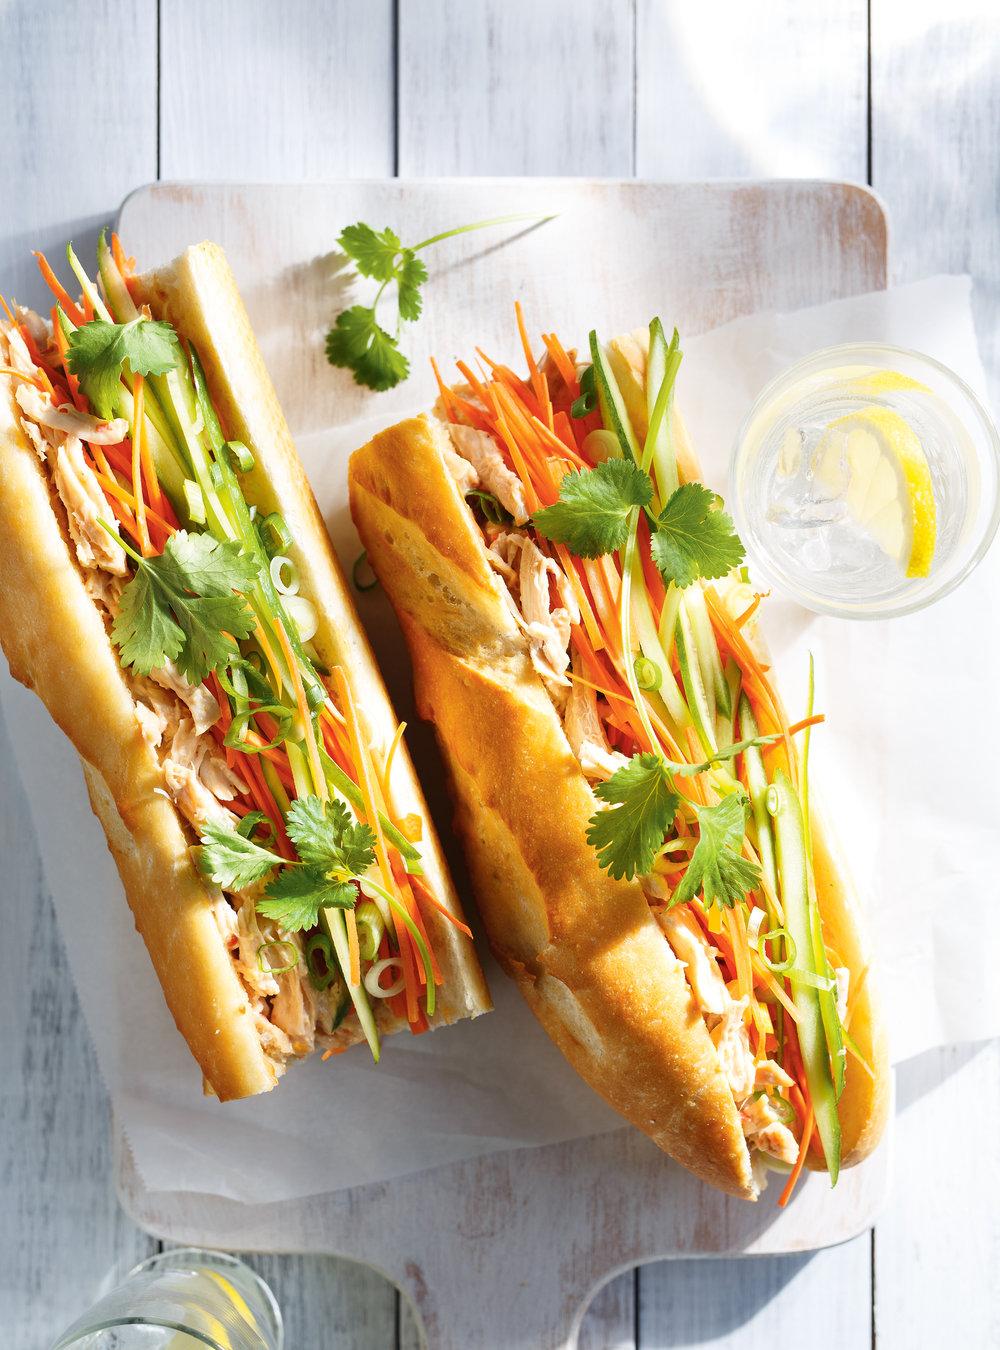 Sandwich au poulet la vietnamienne ricardo - Idee de sandwich froid ...